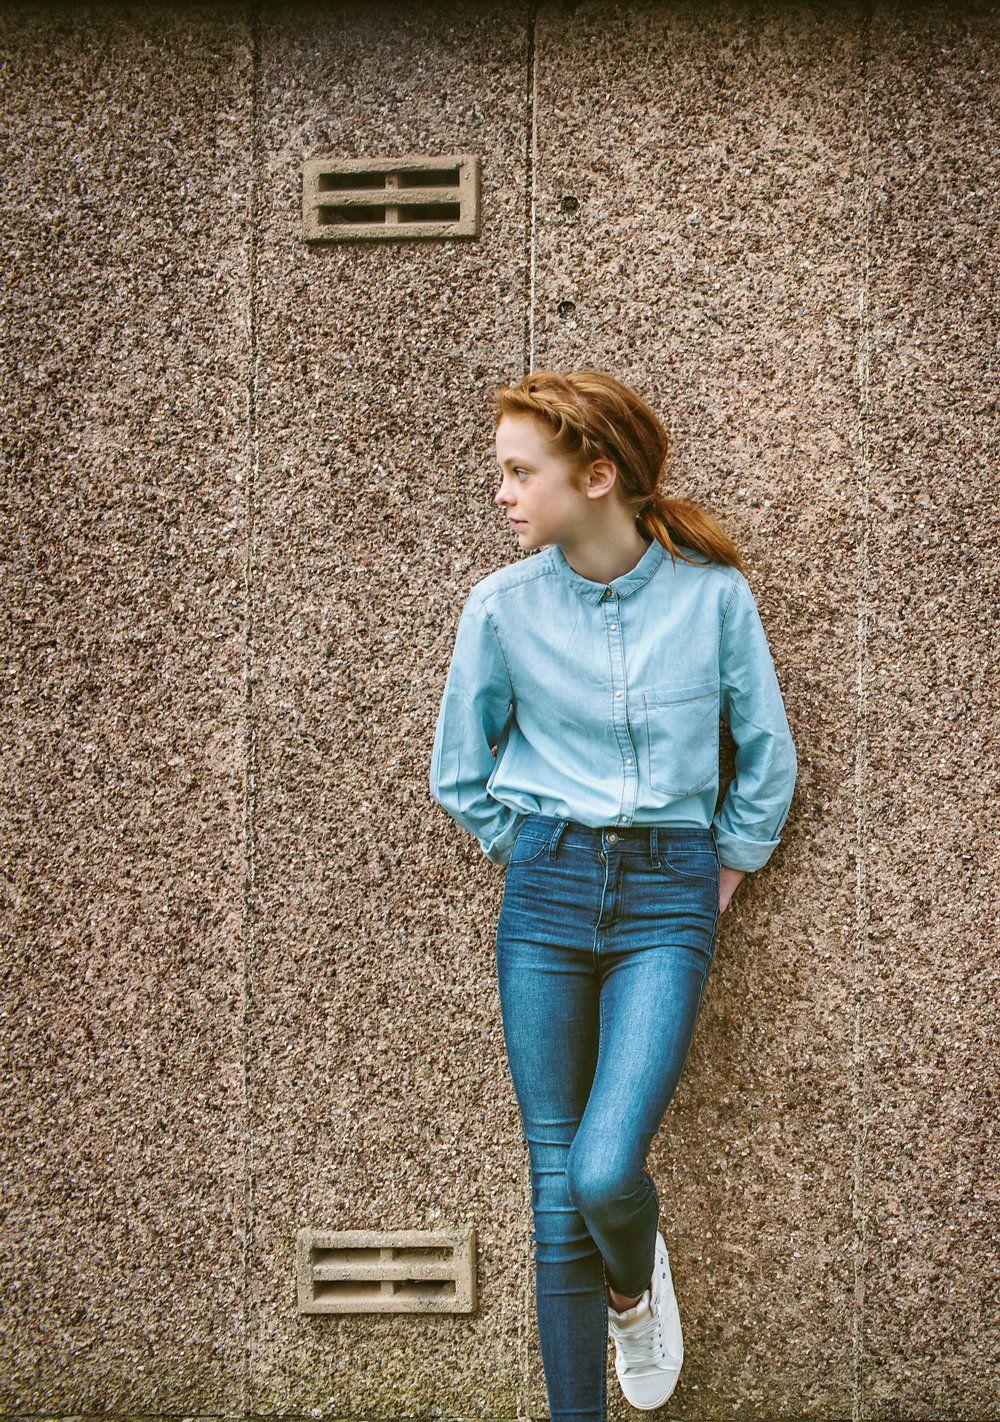 Double denim kids style for summer 2016, kids editorial, kids fashion, girls fashion, girls denim